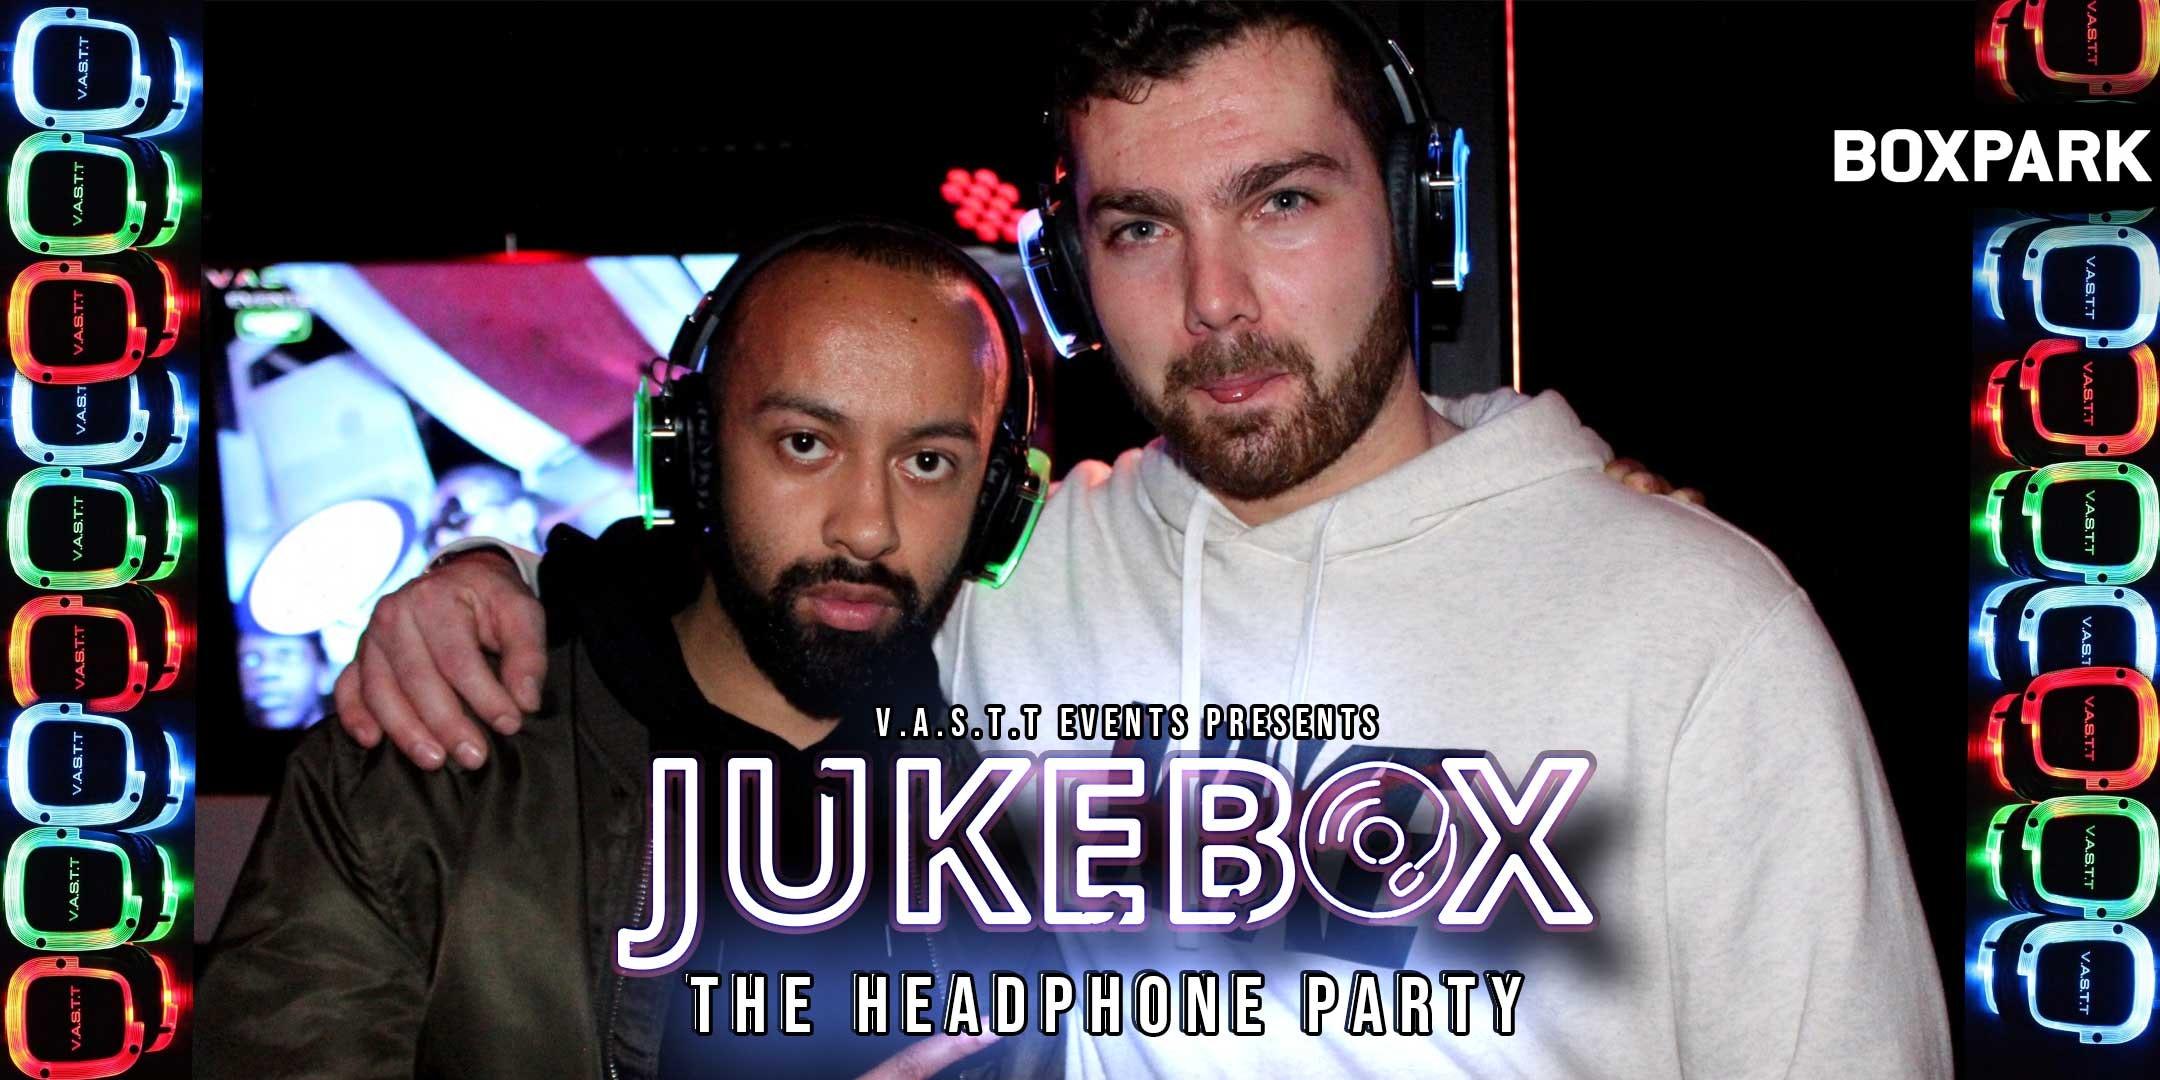 Jukebox – The Headphone party @Boxpark Croydon